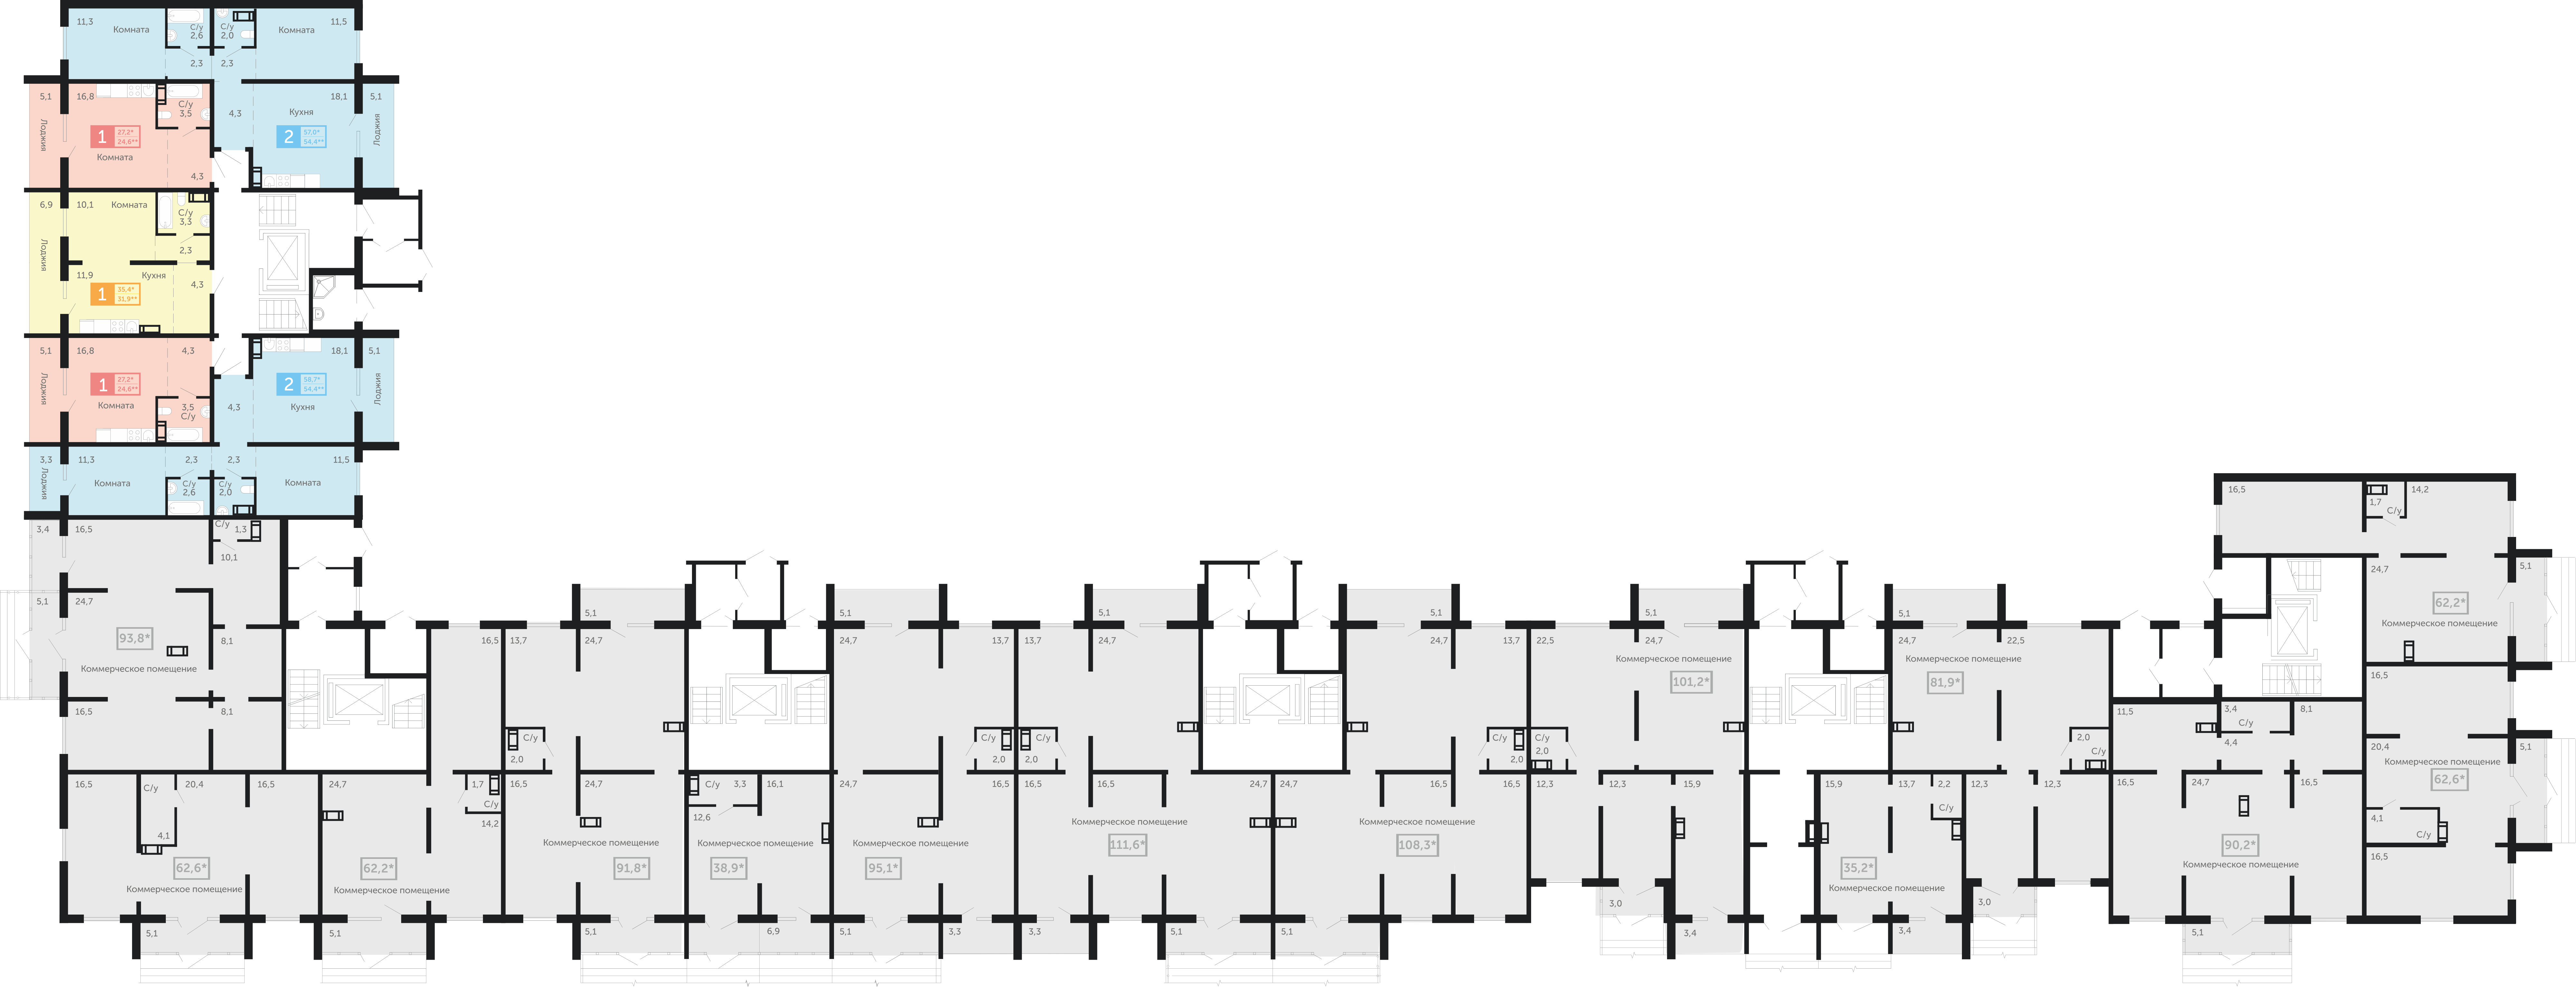 фотография этажа